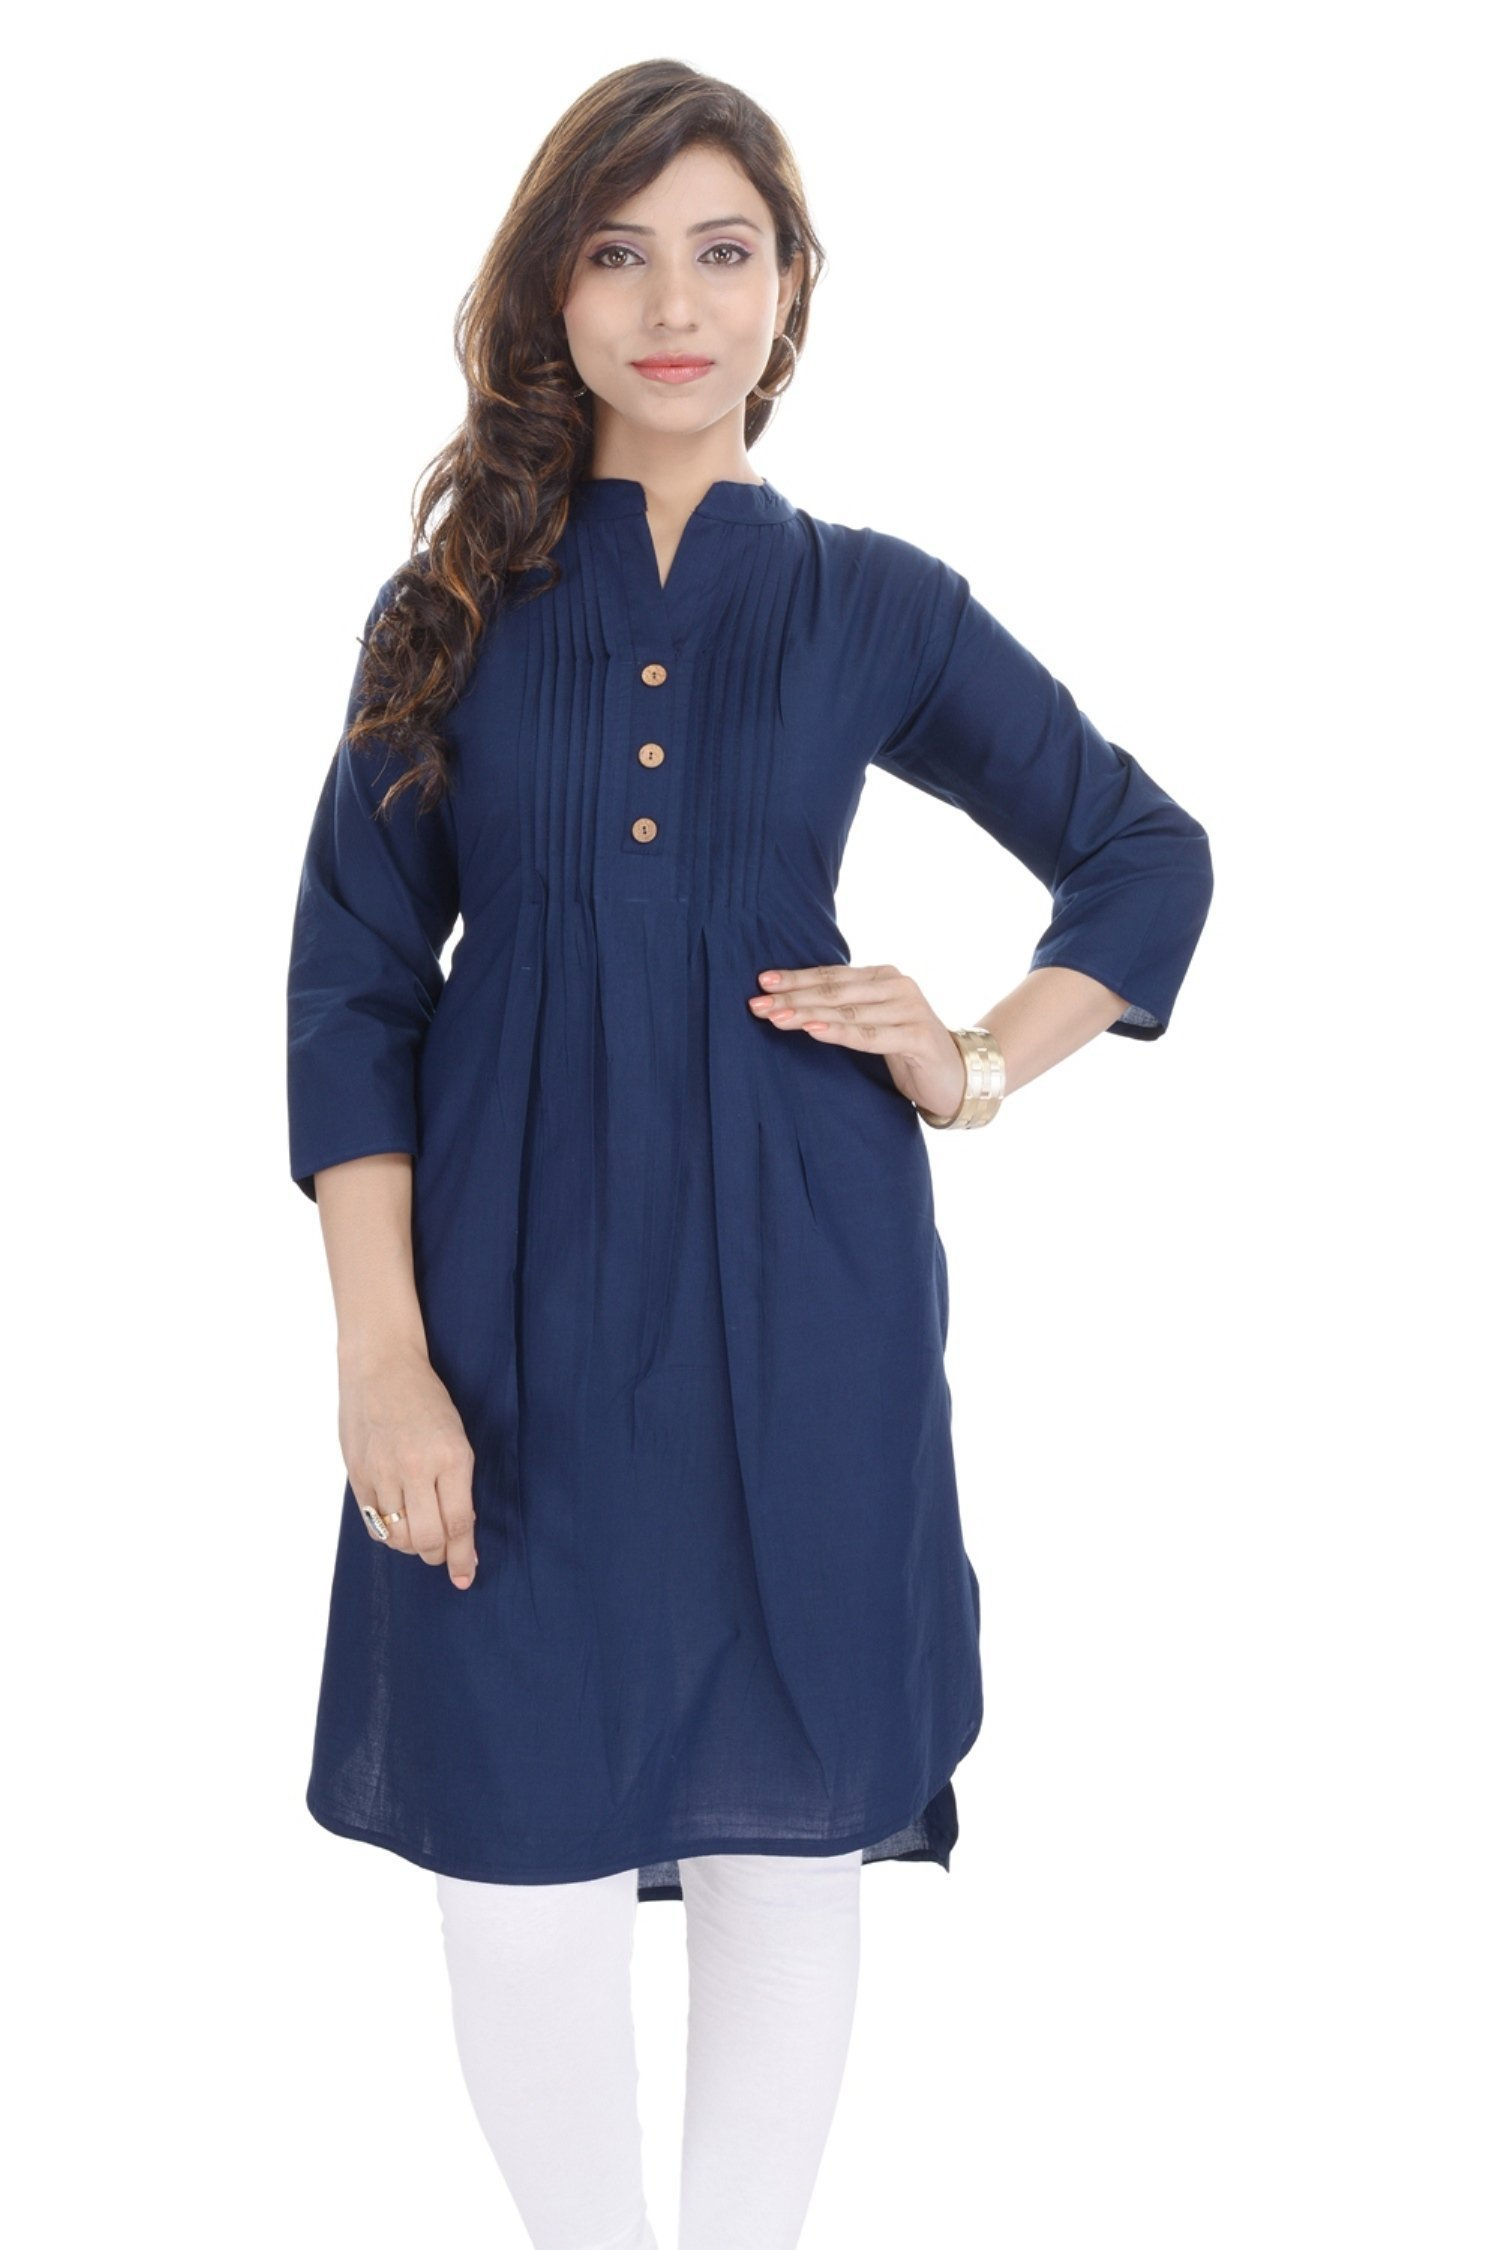 Chichi Women's Casual Printed Cotton Kurti Blue, XXL